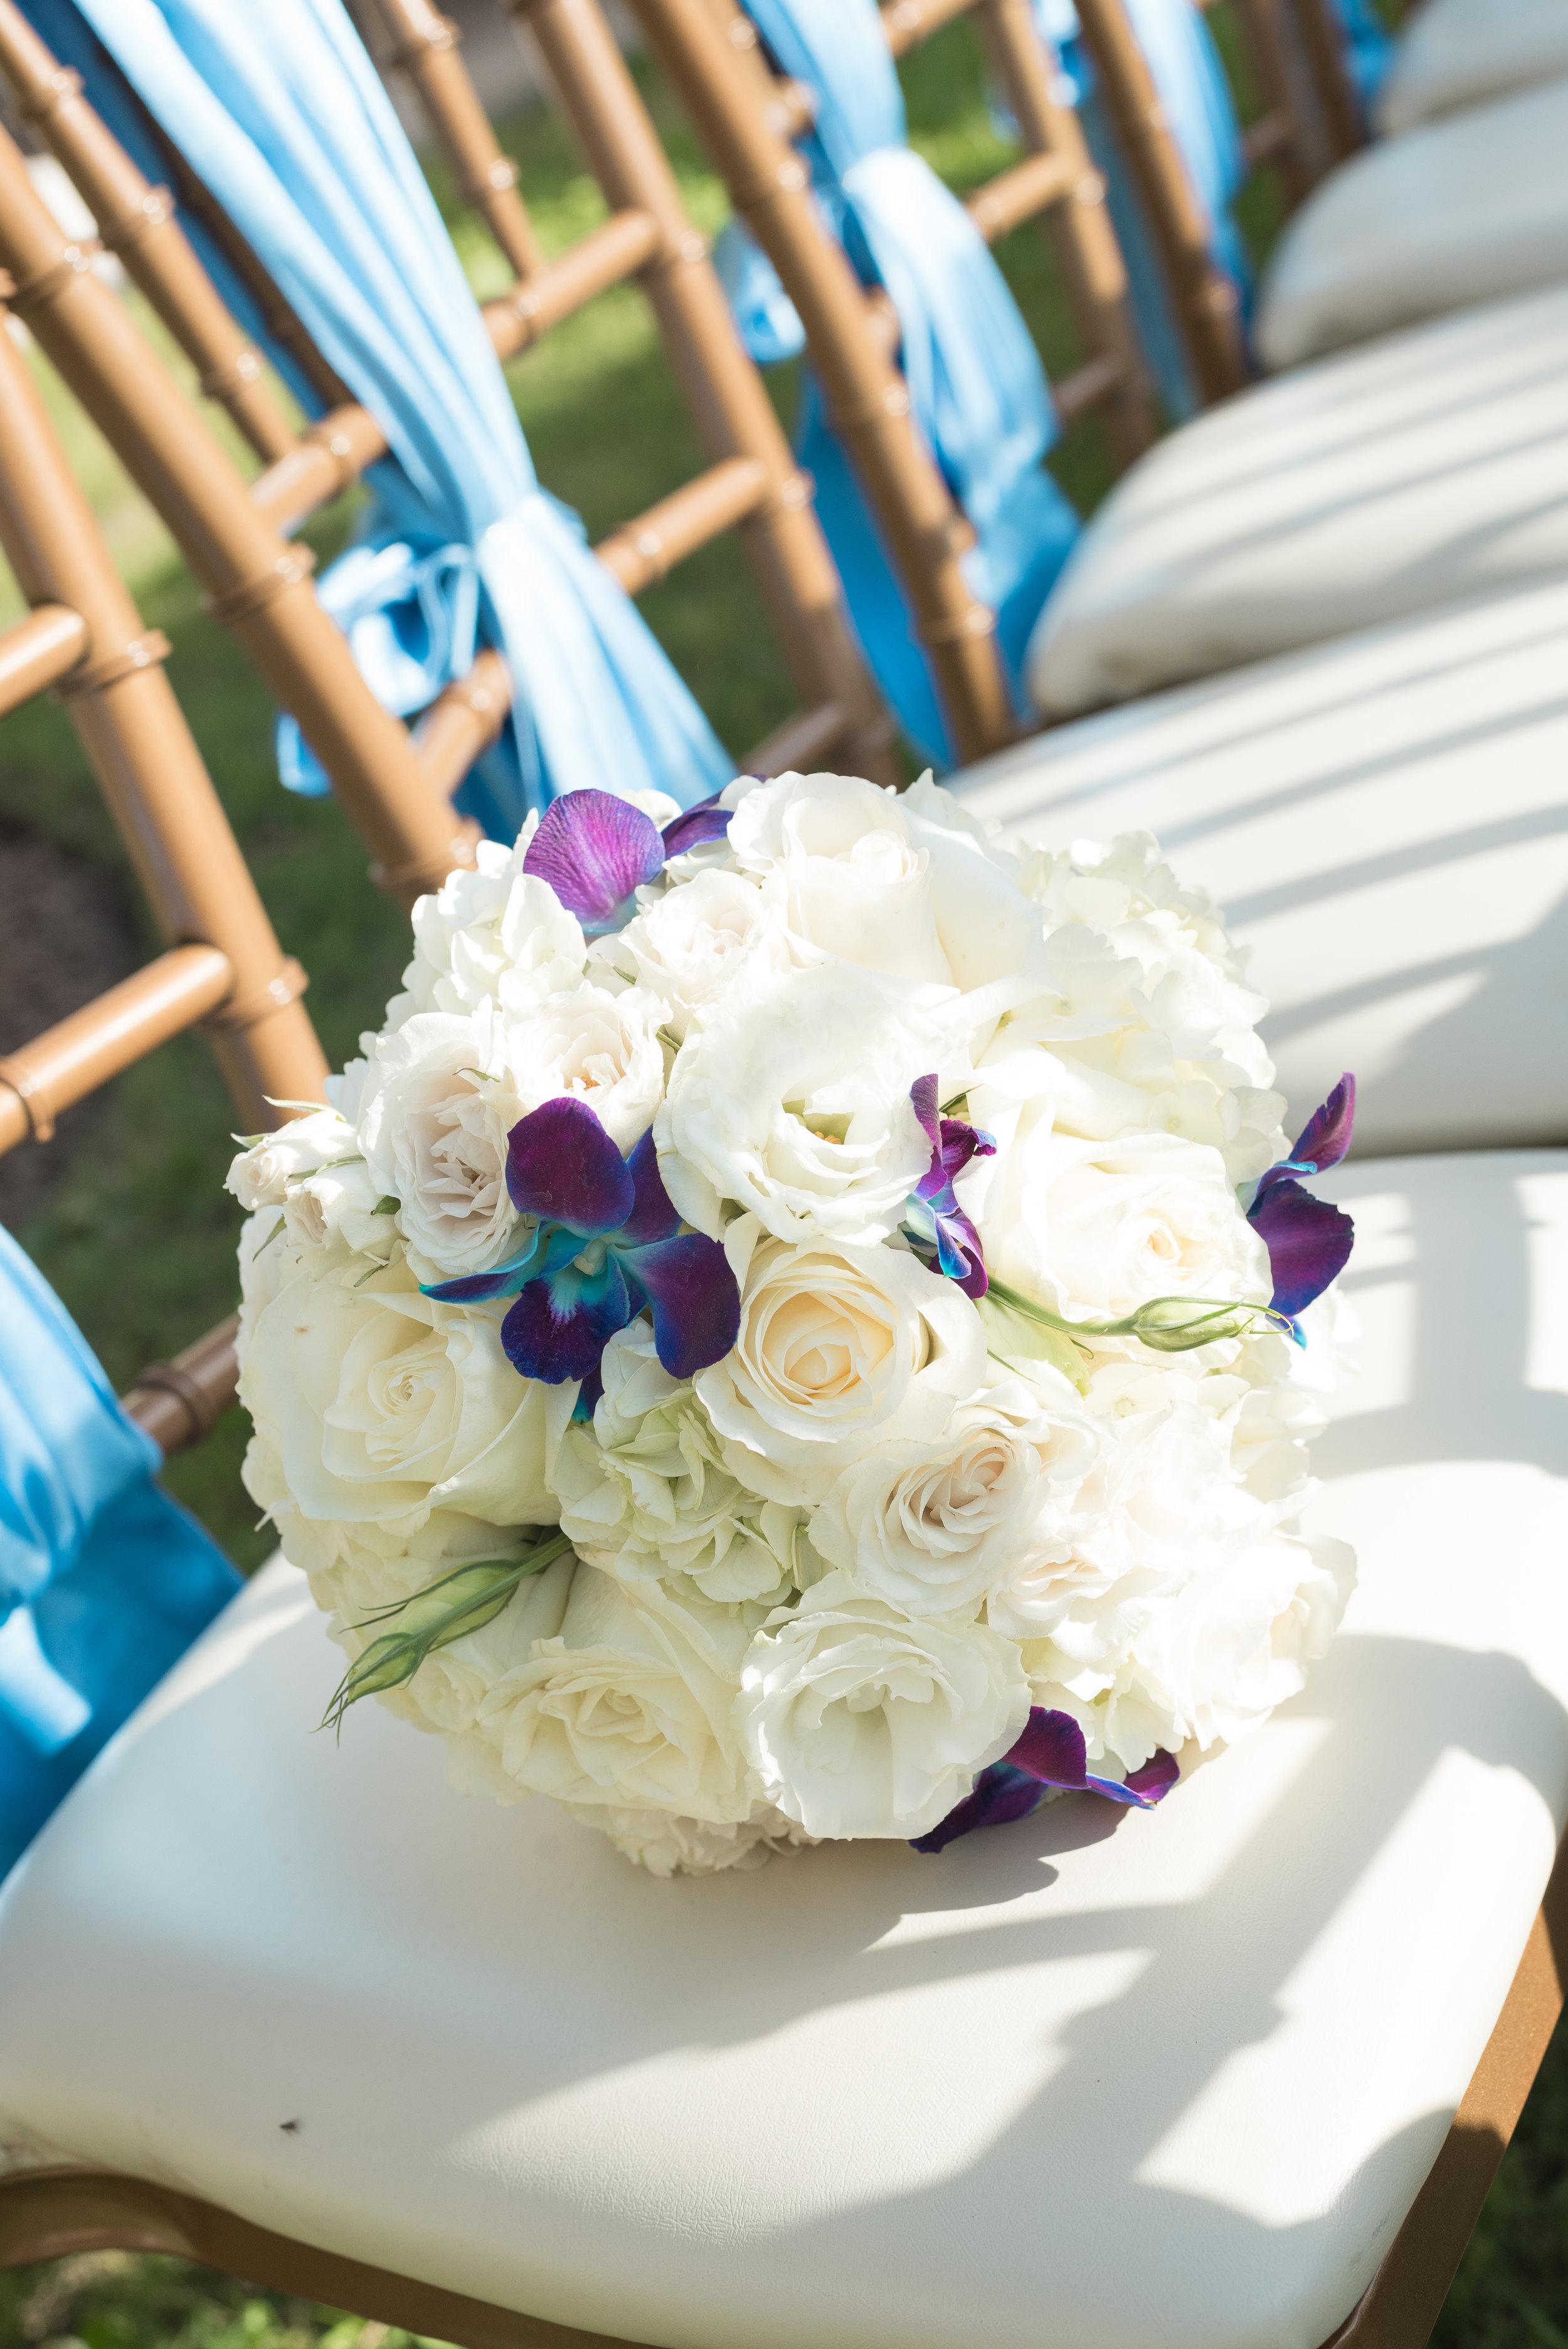 Carl-Kerridge-Photography-North-Beach-Wedding-May-2015-110.jpg